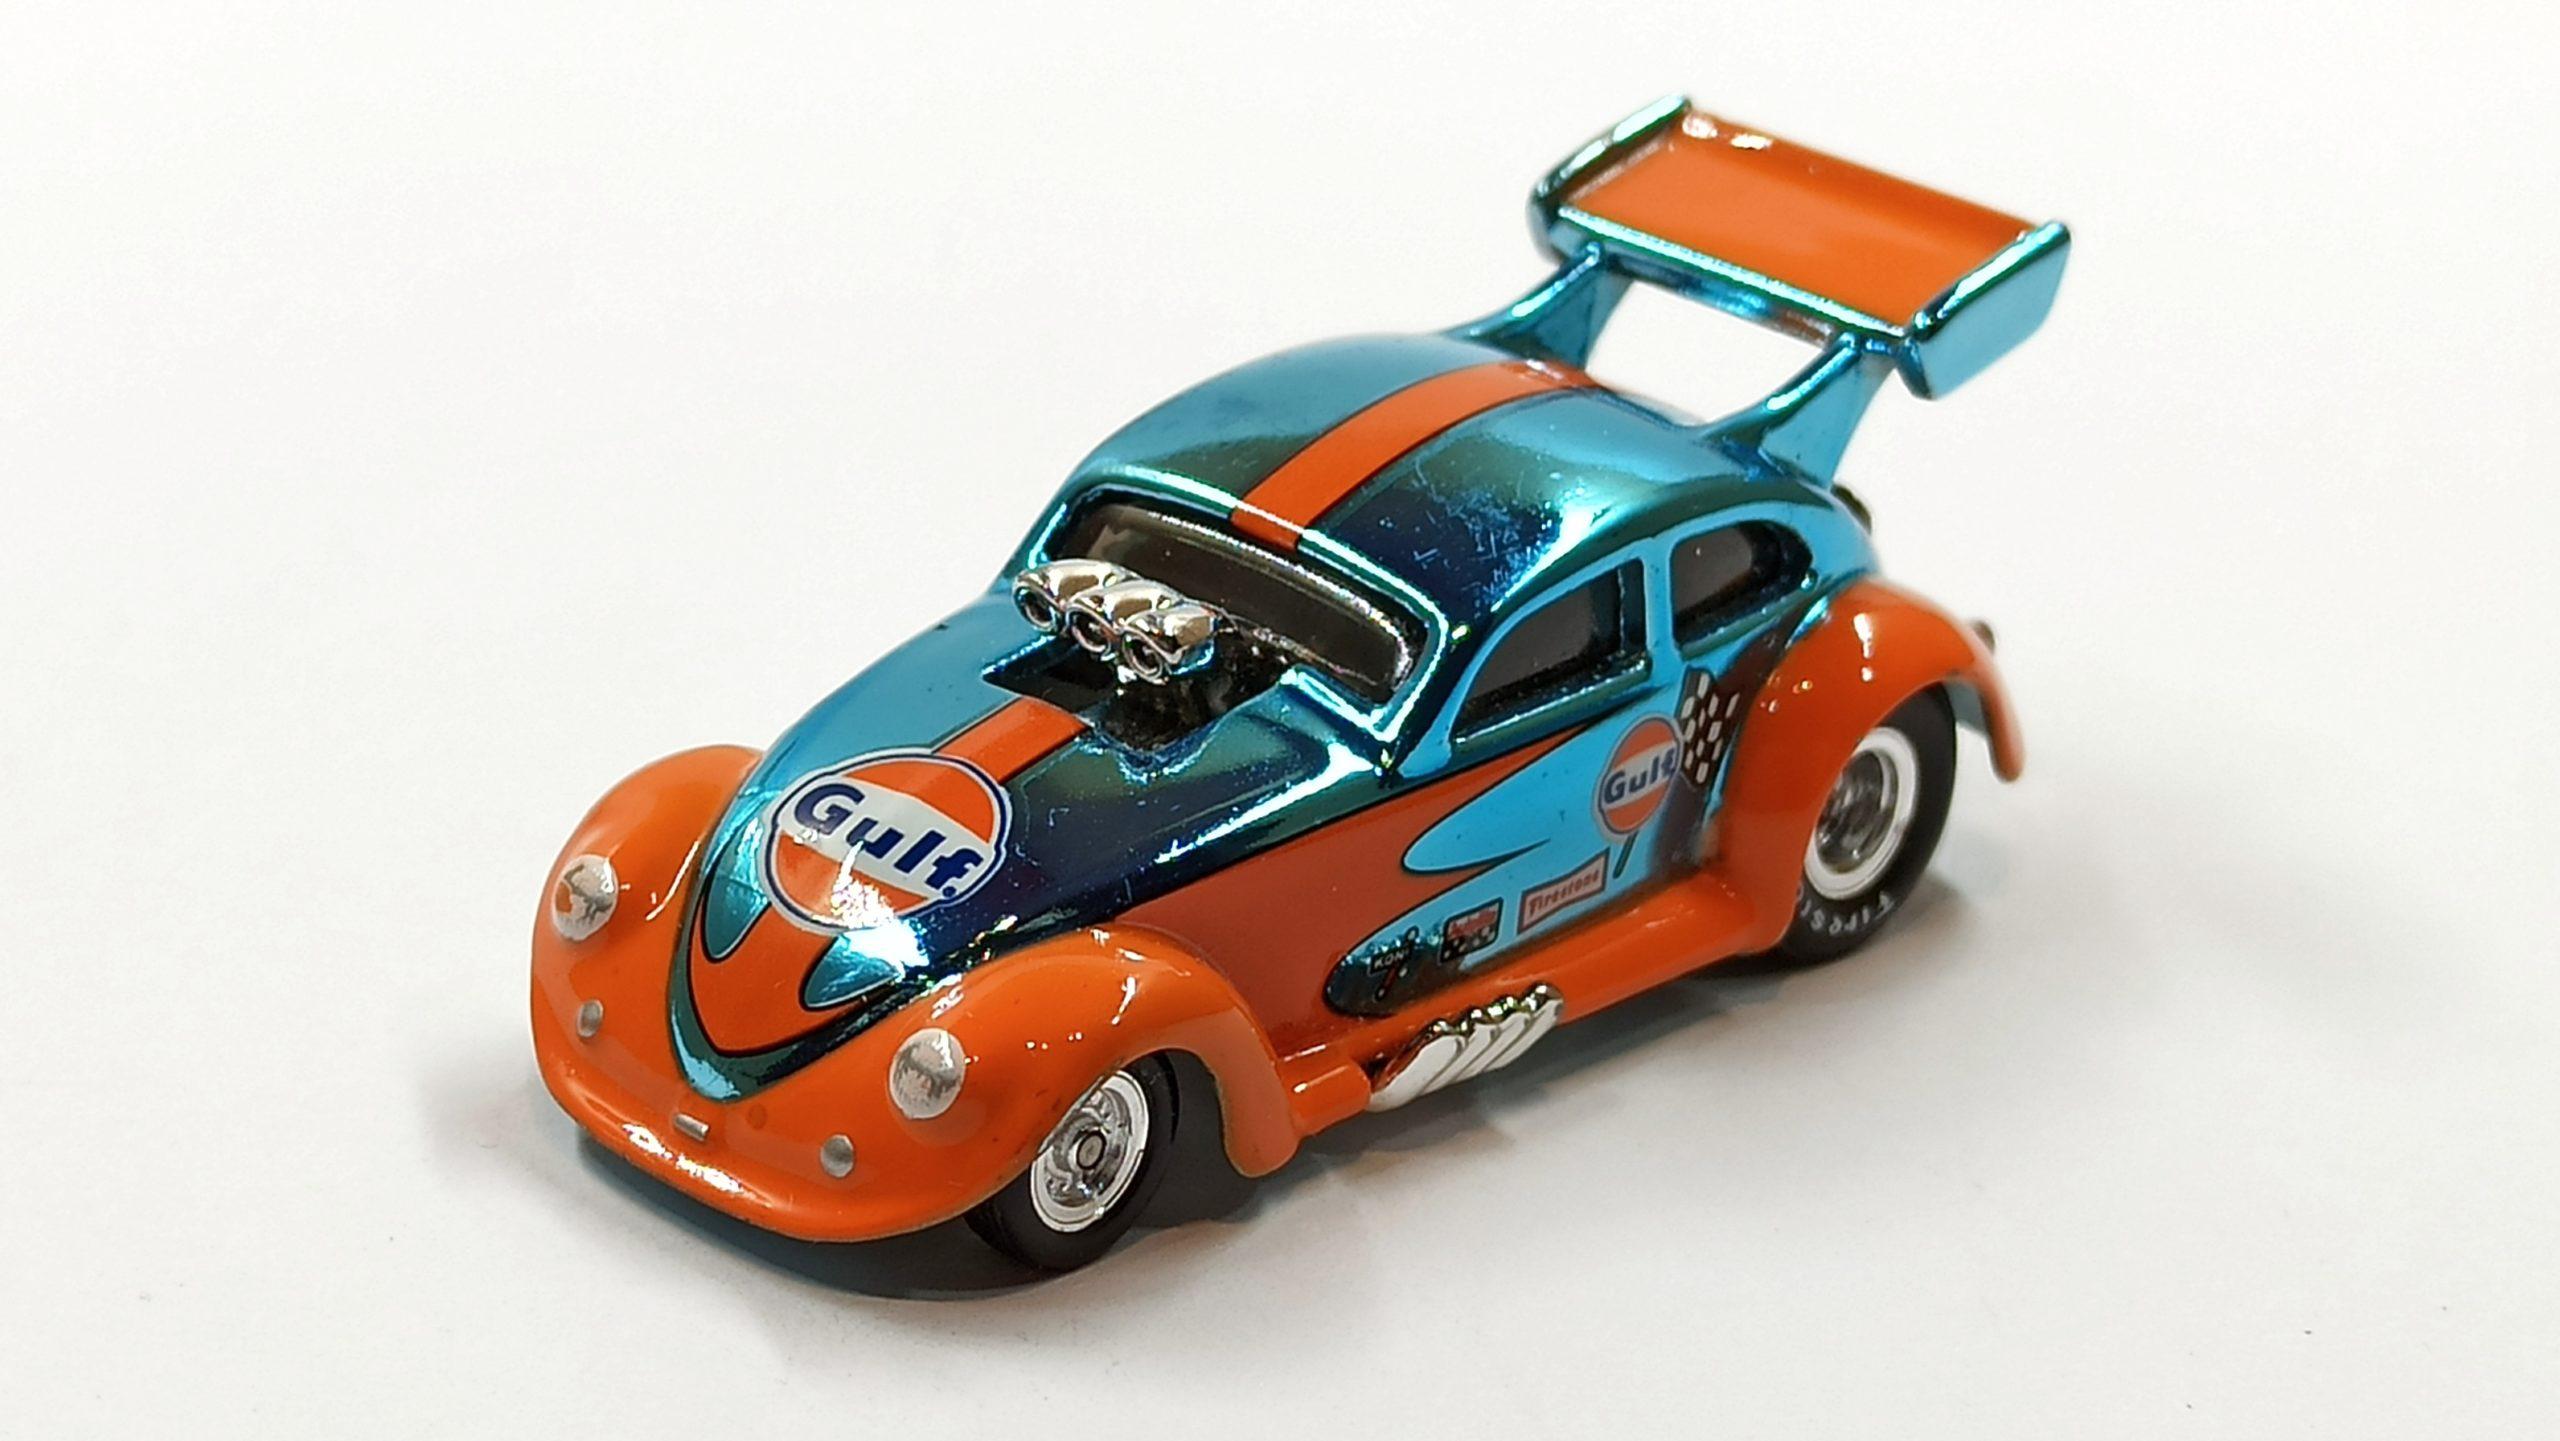 Hot Wheels Custom '56 Volkswagen Drag Beetle (Y0452) 2013 HWC Gulf Racing (3/4) (1 of 4.000) spectraflame light blue (Gulf) top angle